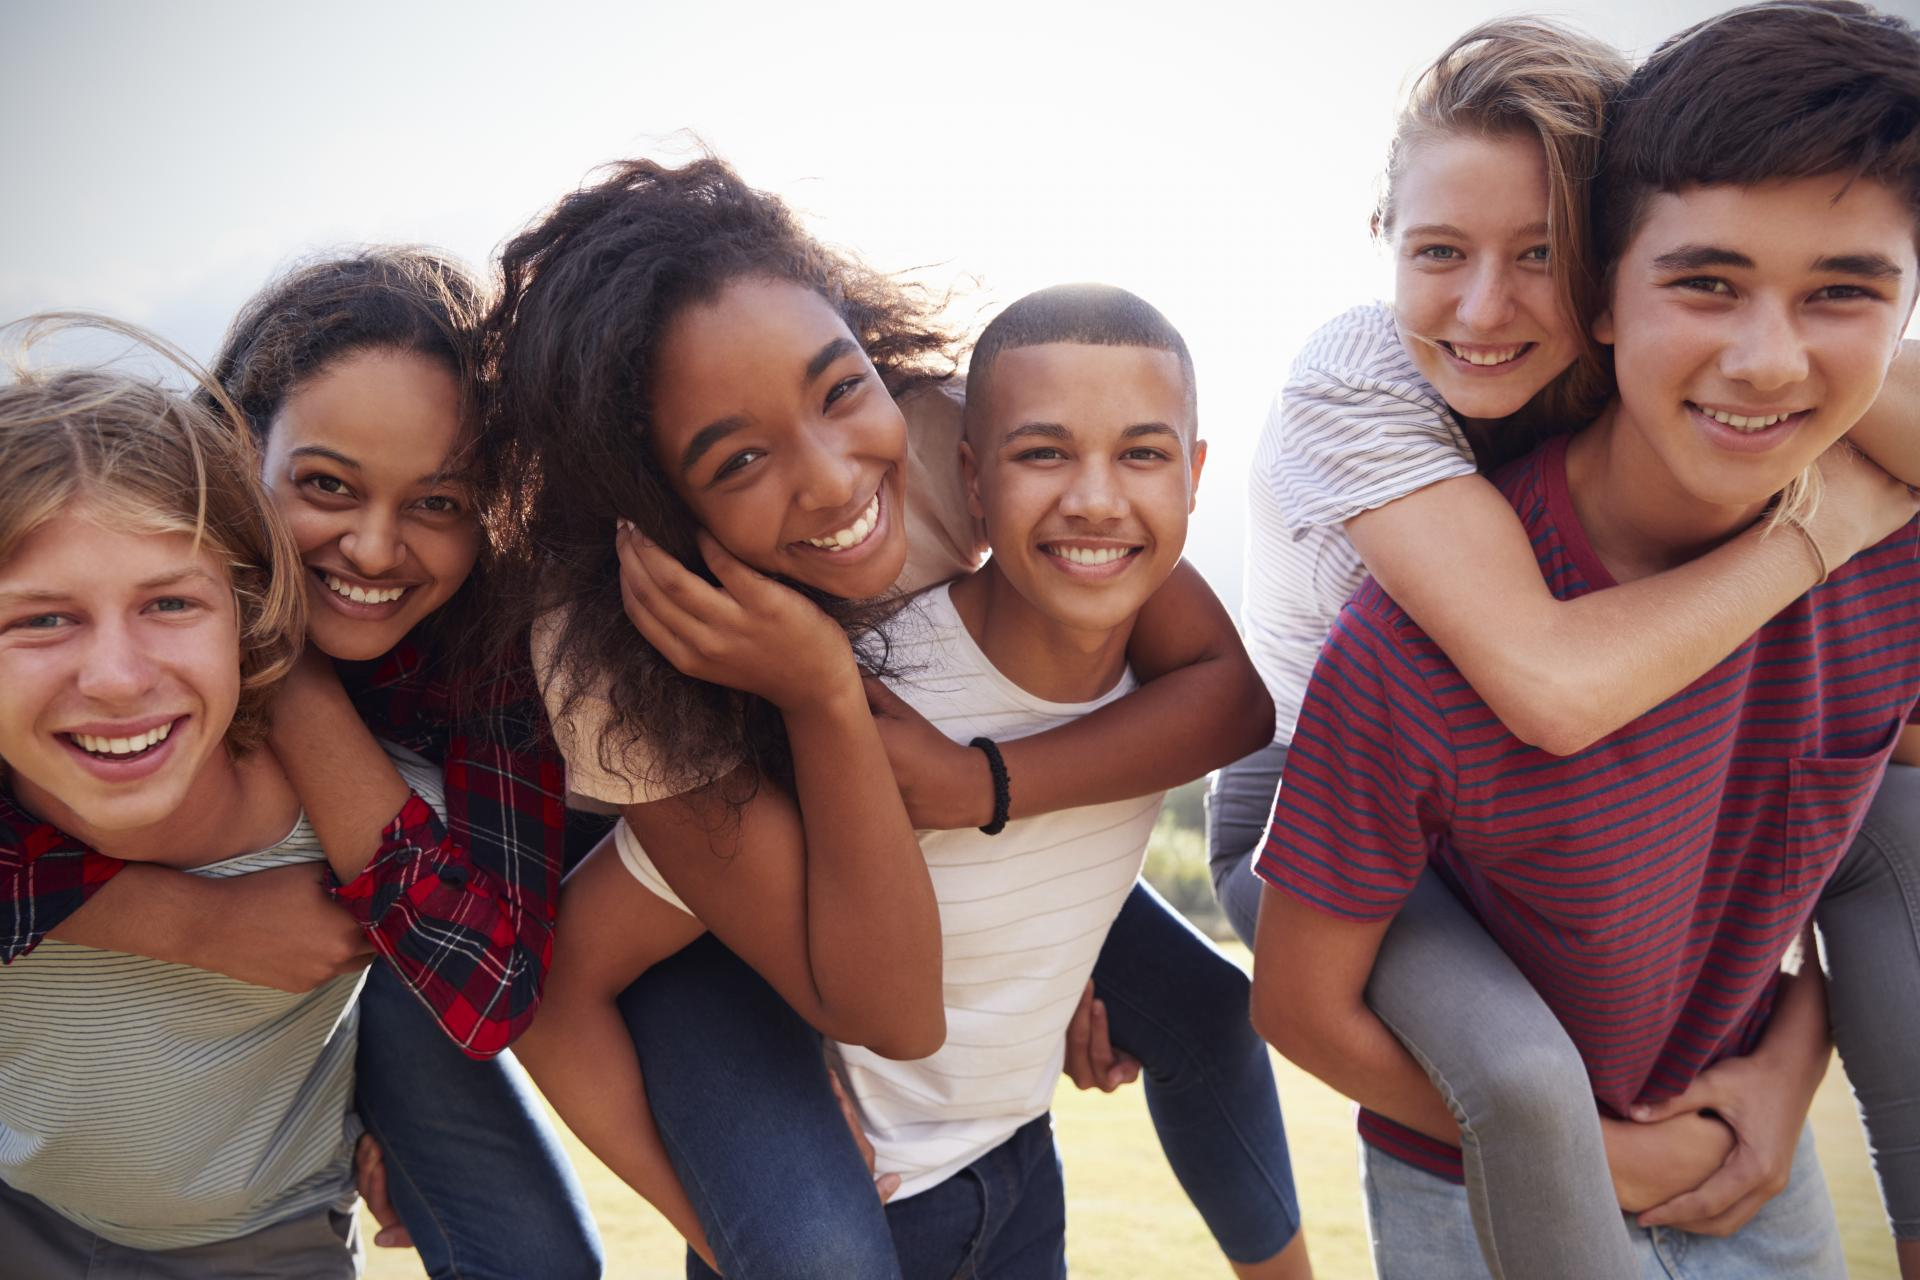 Blije groep mensen jongeren